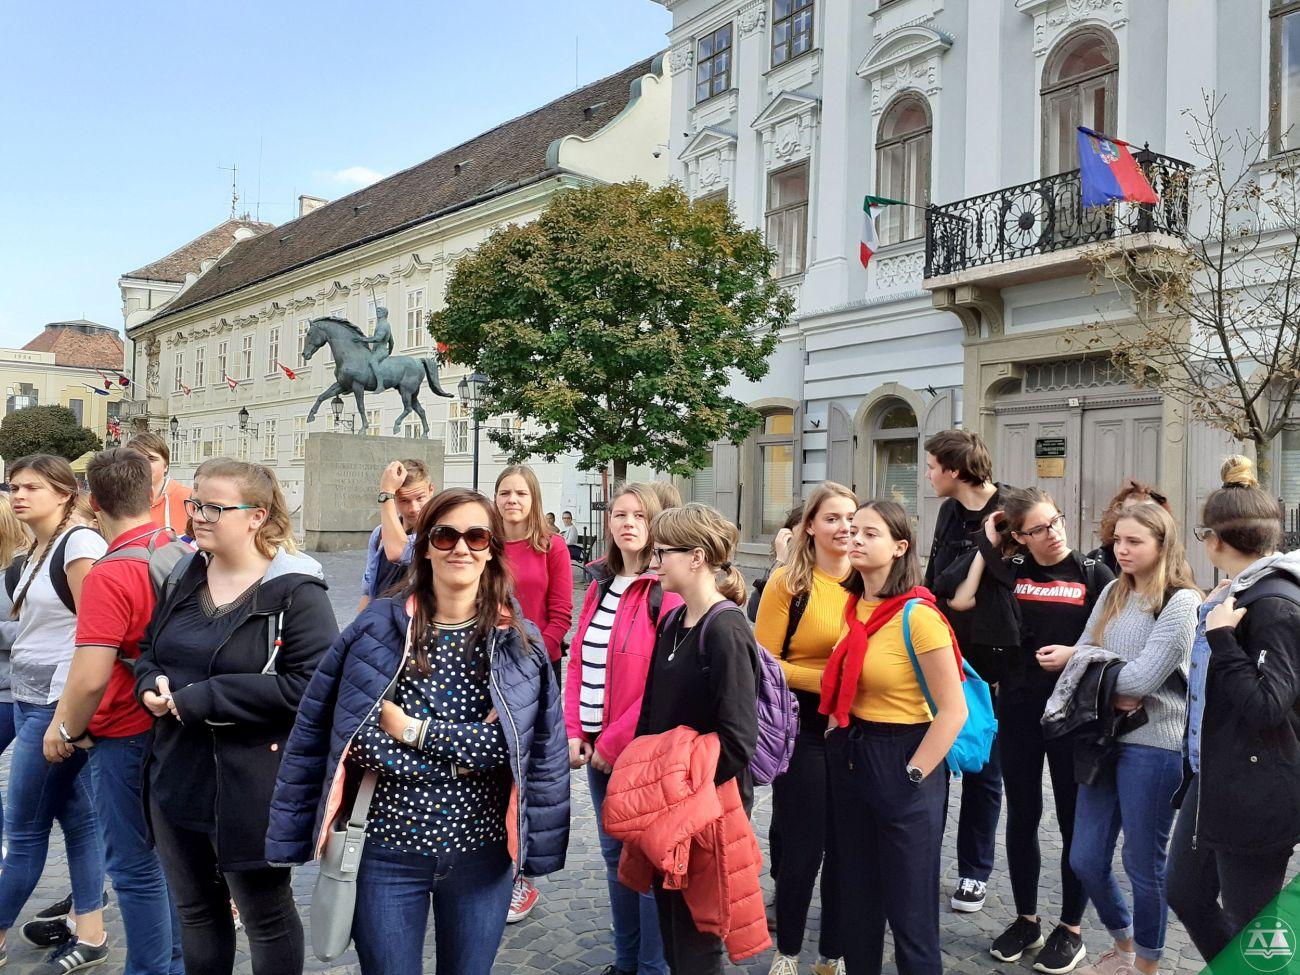 Strokovna-ekskurzija-v-Szekesfehervar-2019-021